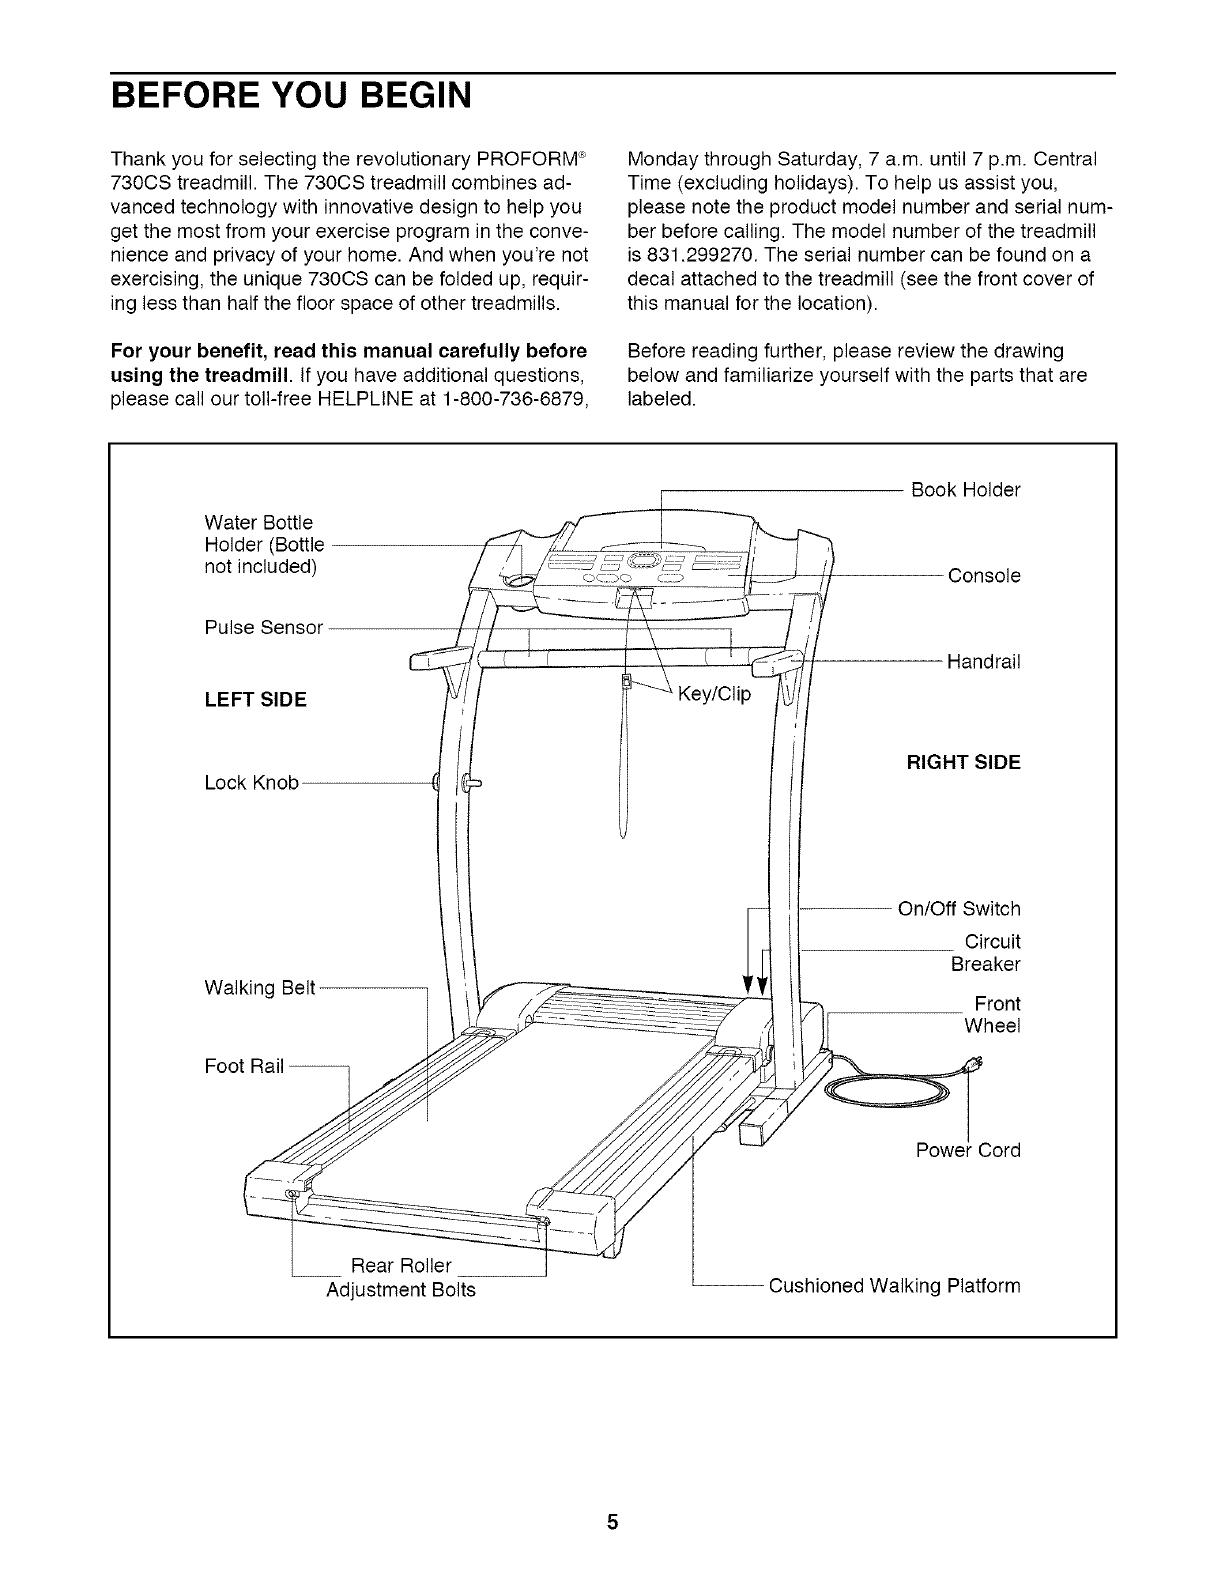 Proform 831299270 User Manual 730cs Manuals And Guides Lr707400 Treadmill Wiring Diagram